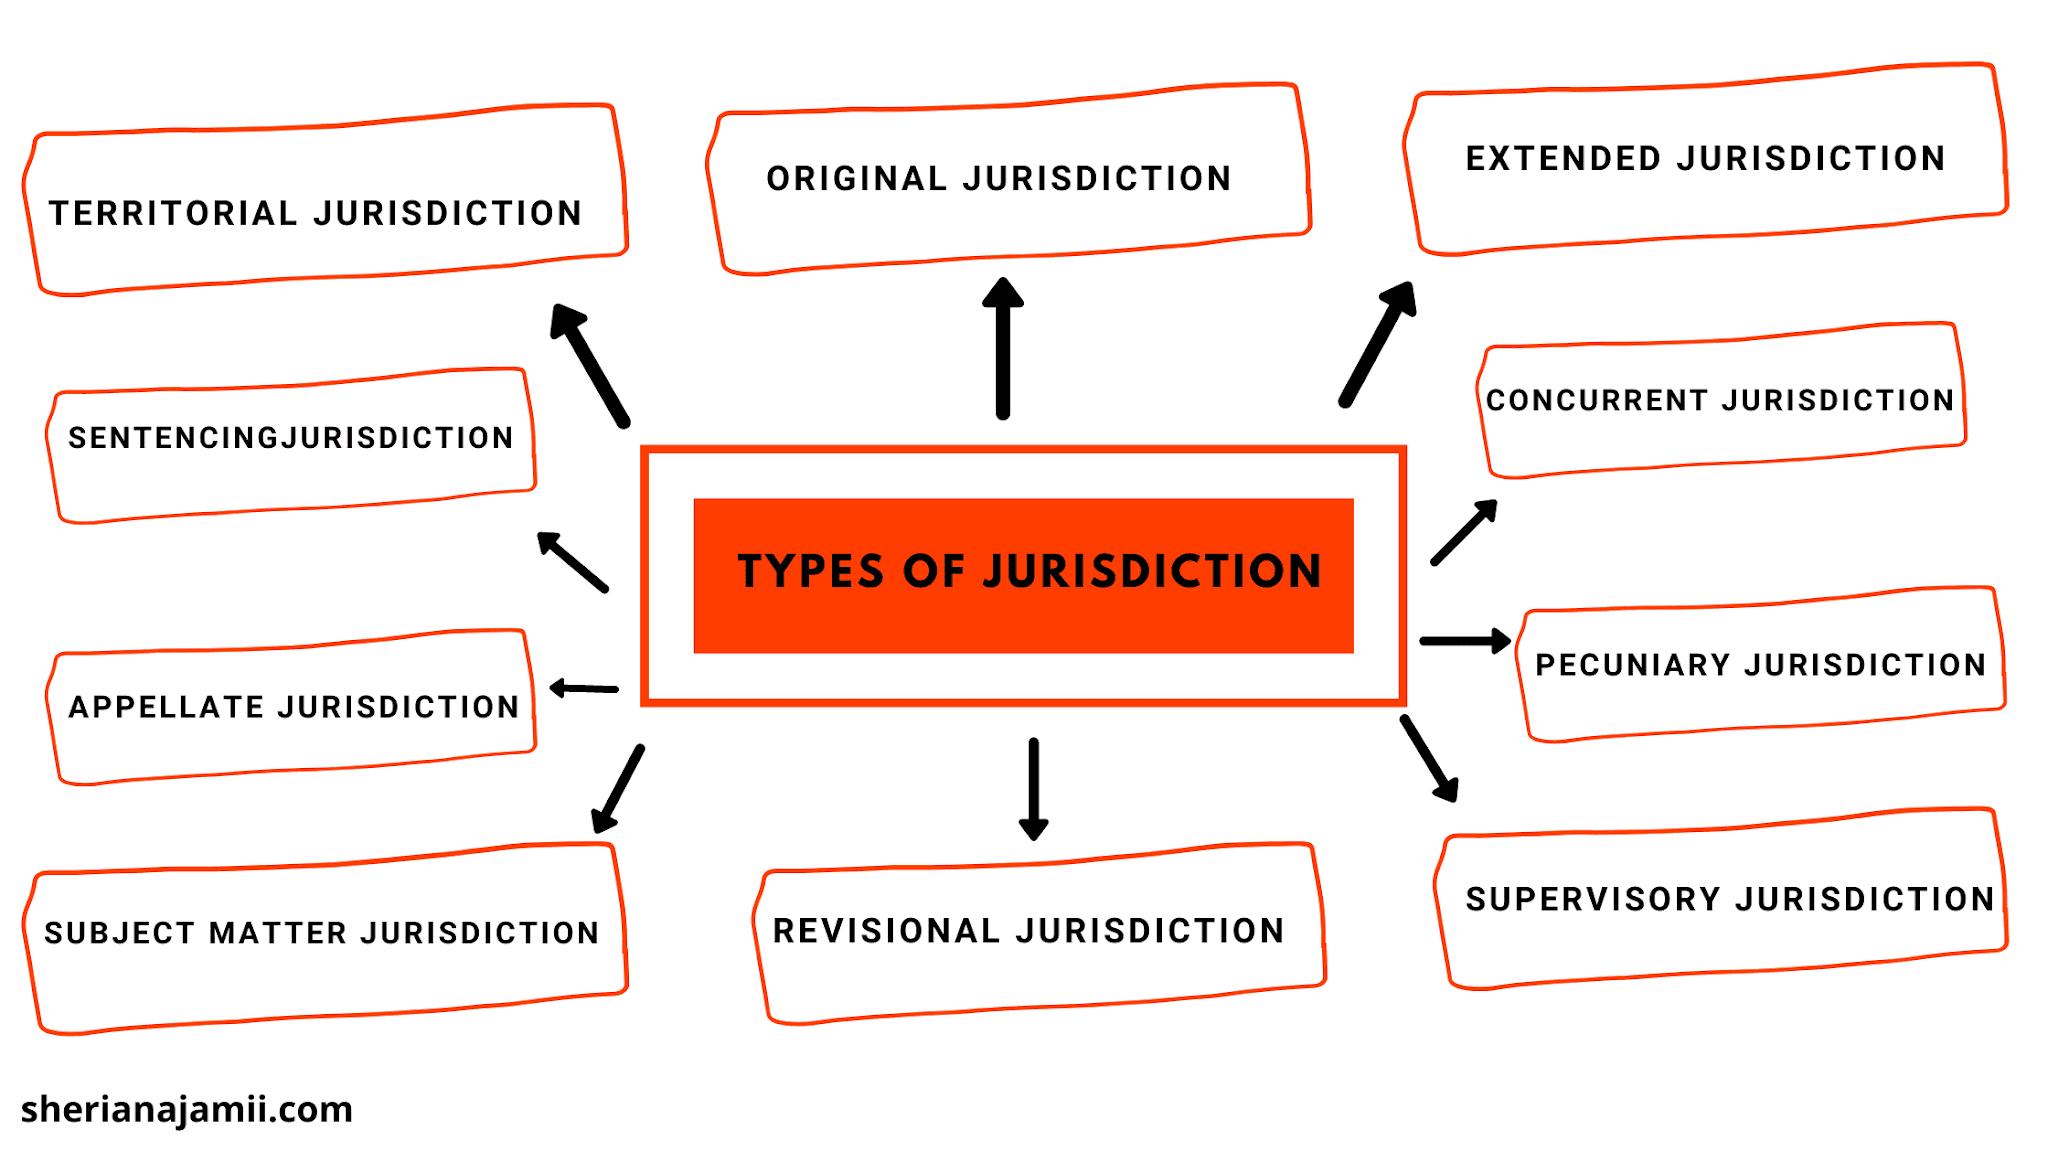 types of jurisdiction, Original Jurisdiction, Territorial jurisdiction, Subject matter jurisdiction, Pecuniary Jurisdiction, Extended Jurisdiction, Revisional Jurisdiction, Supervisory Jurisdiction, Appellate Jurisdiction, Concurrent jurisdiction, Sentencing Jurisdiction